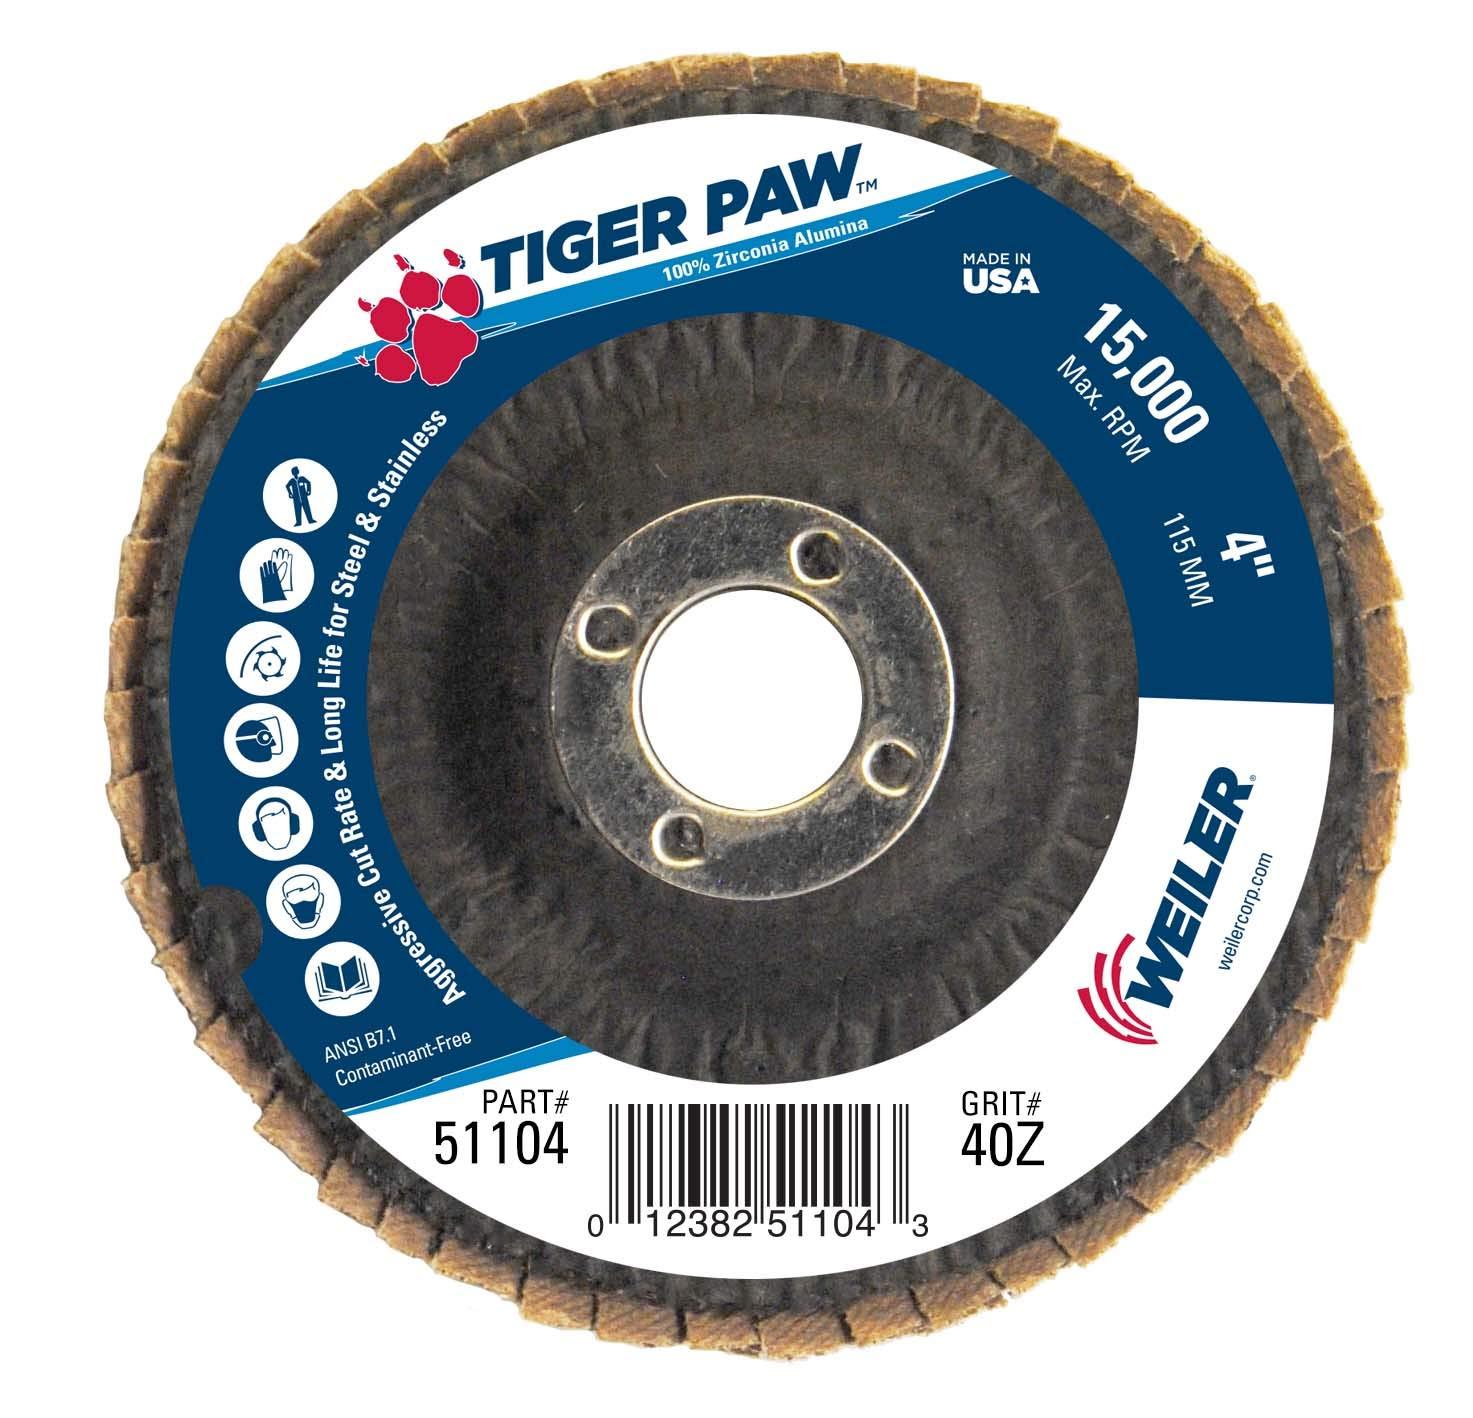 Phenolic Backing 4 Diameter 5//8 Arbor Weiler Corporation 5//8 Arbor Zirconia Alumina Weiler 51105 Tiger Paw High Performance Abrasive Flap Disc Pack of 10 Type 29 Angled Style 15000 RPM 60 Grit 4 Diameter